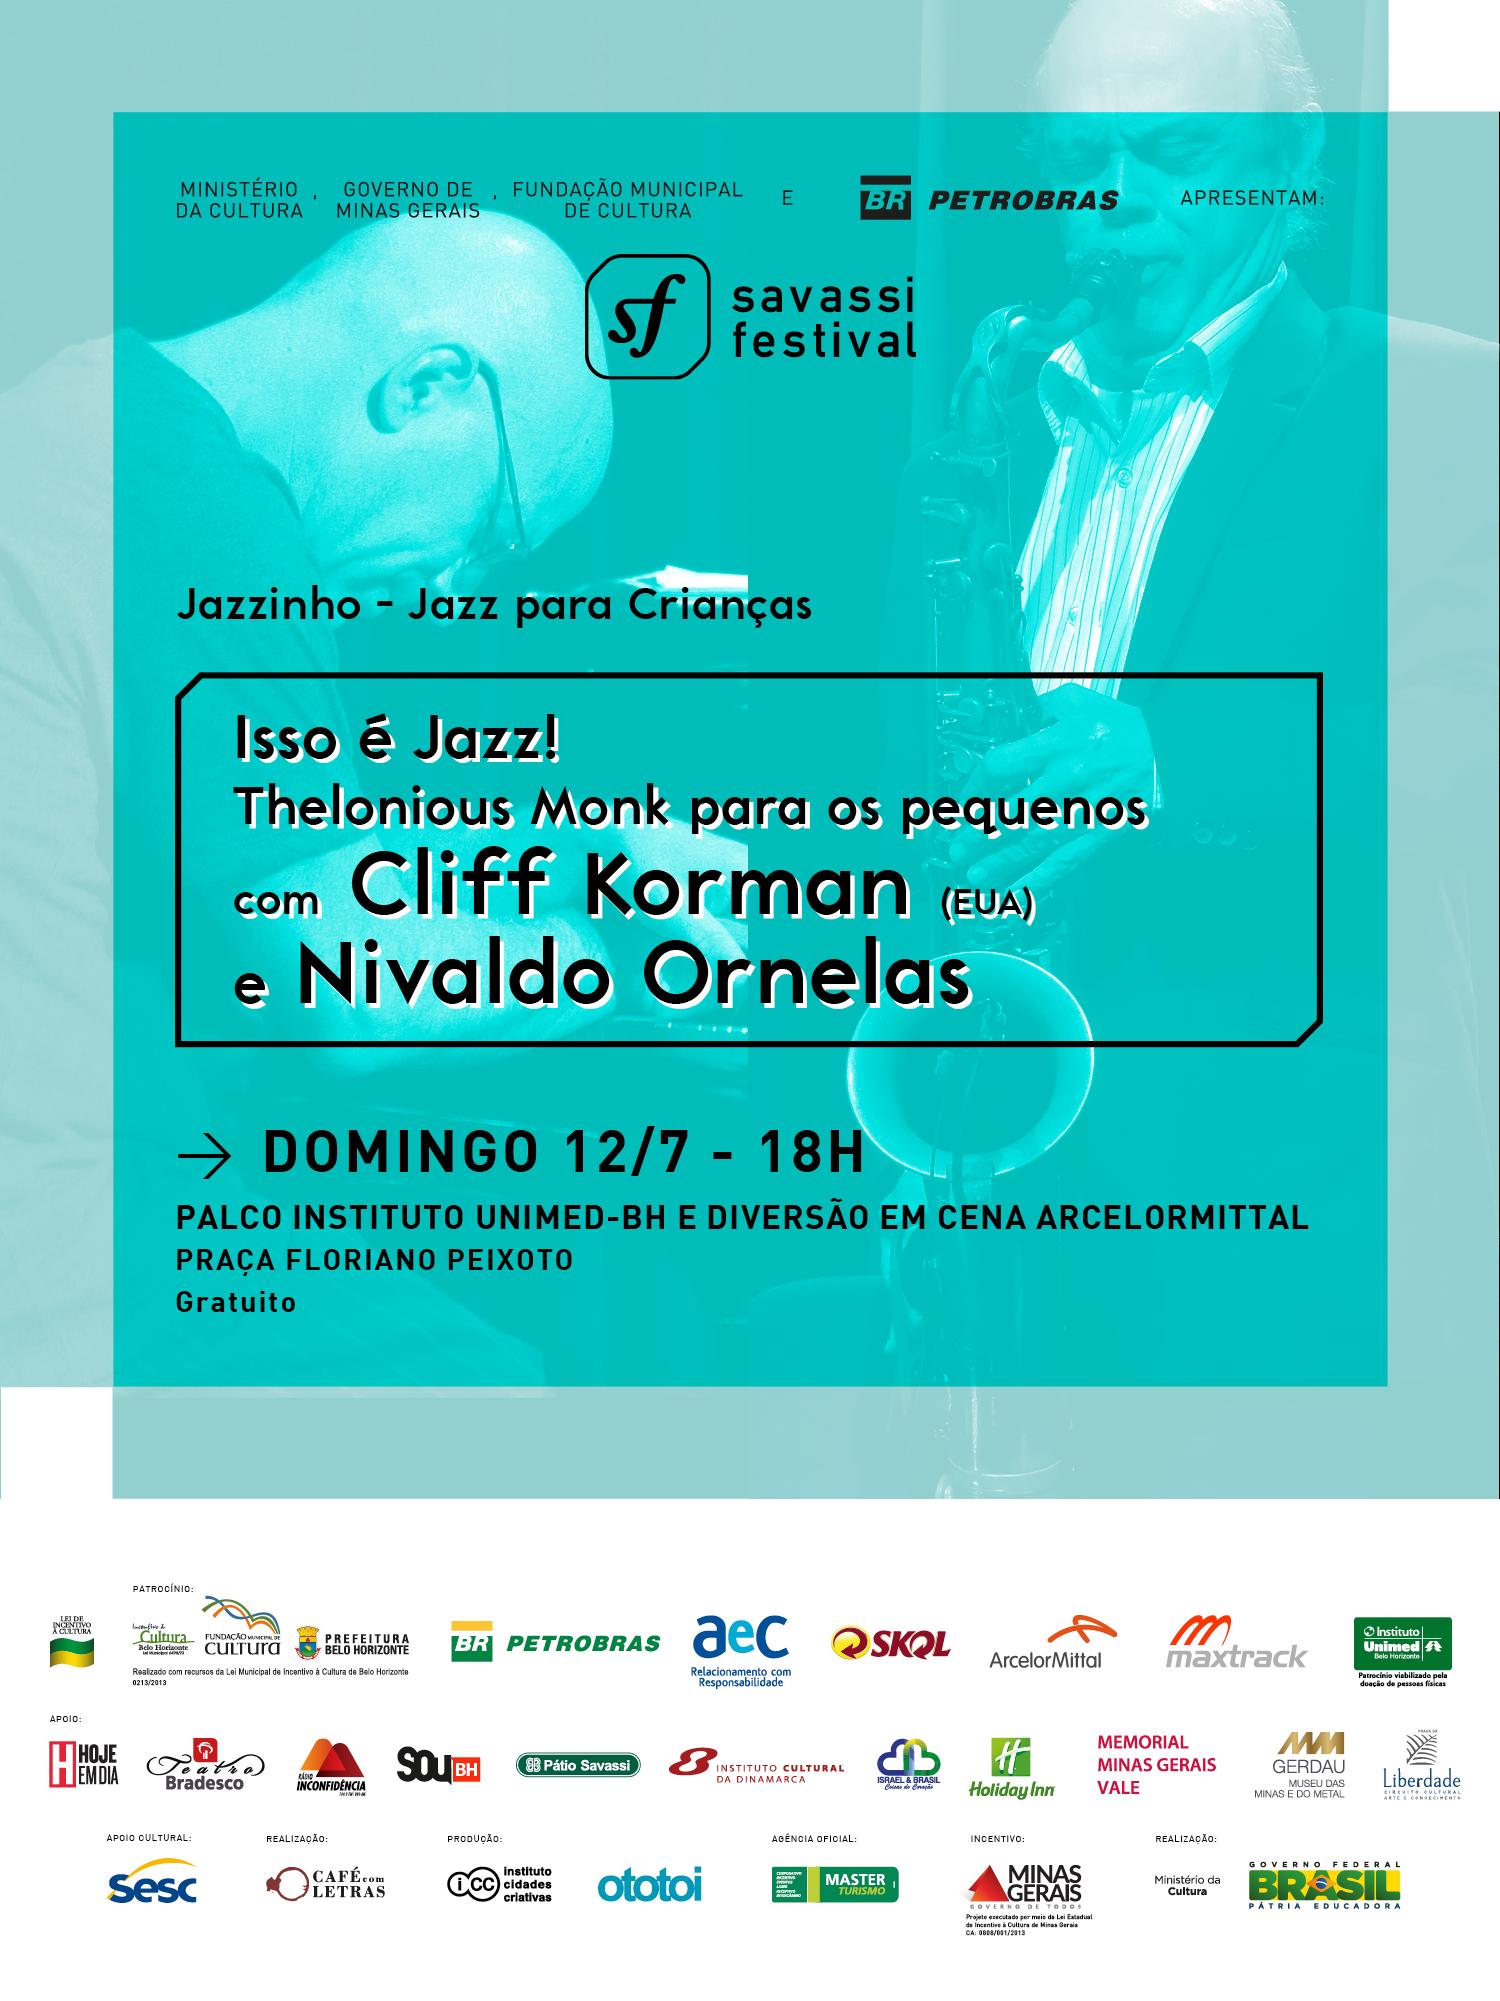 Isso-e-Jazz_Webflyer_Nivaldo